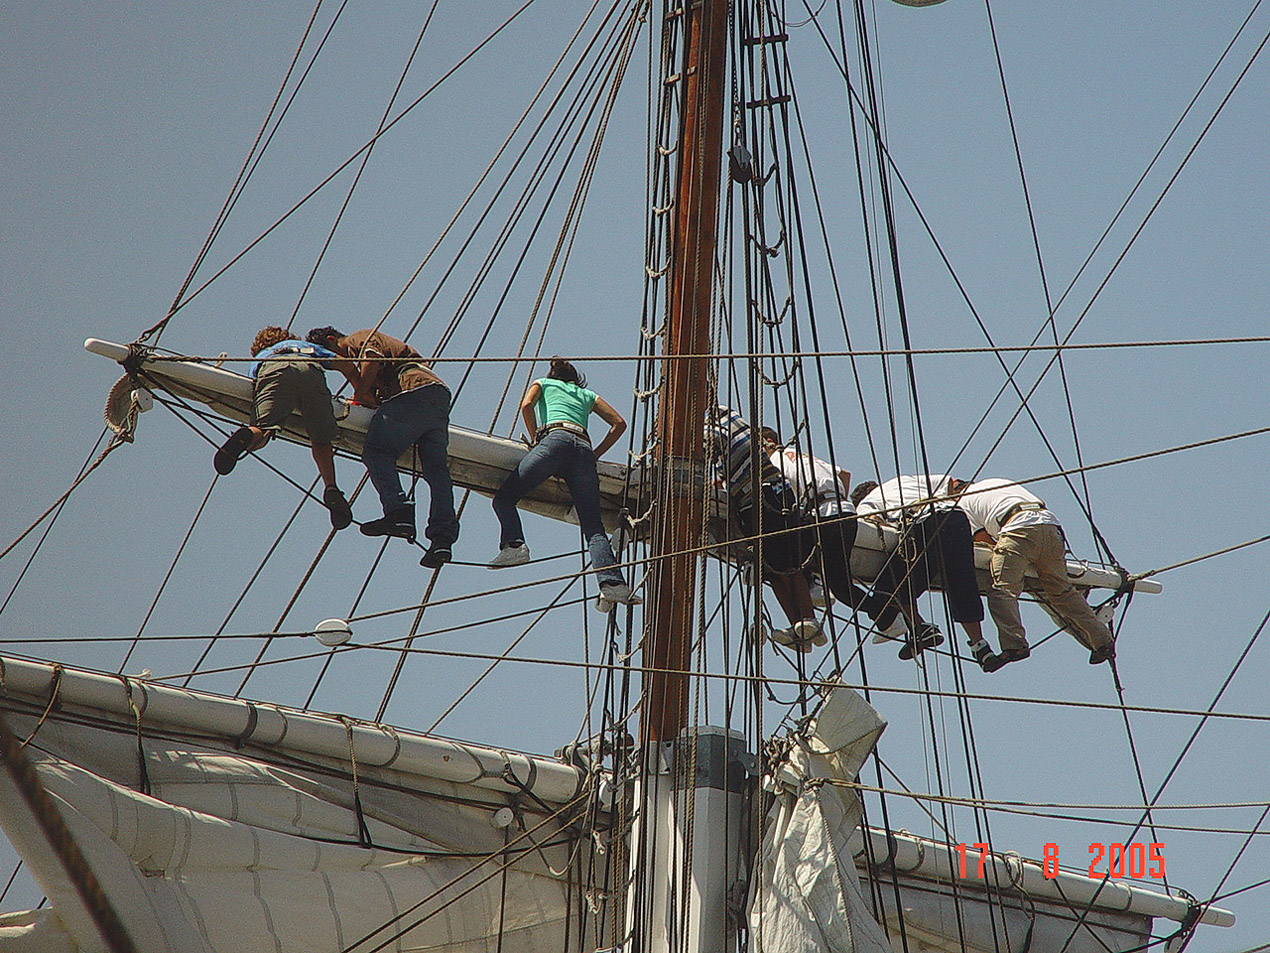 053 Reefing topsail on Exy Johnson.jpg